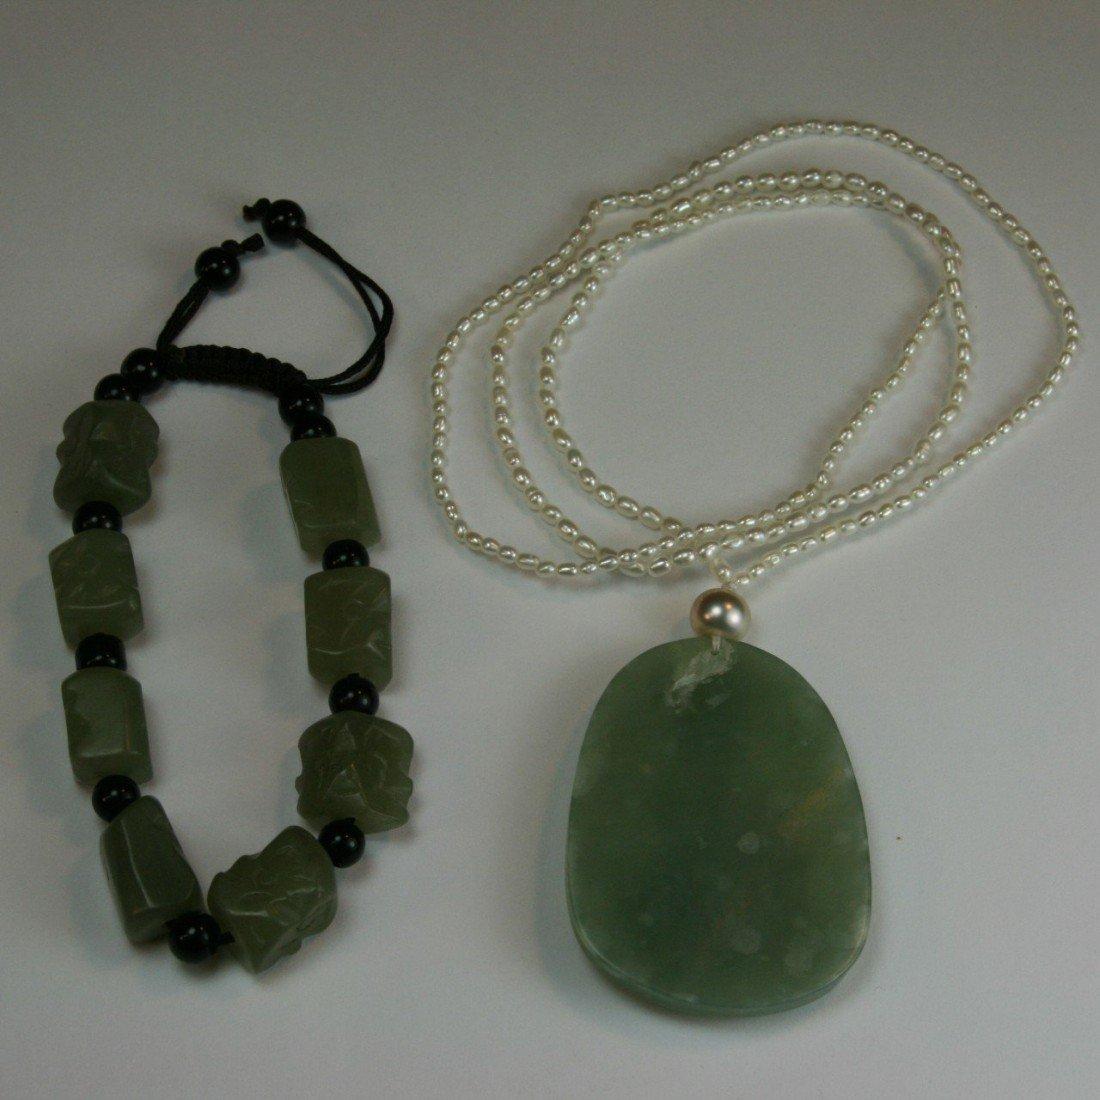 90: Chinese Celadon Jade Bracelet and Pendant - 2